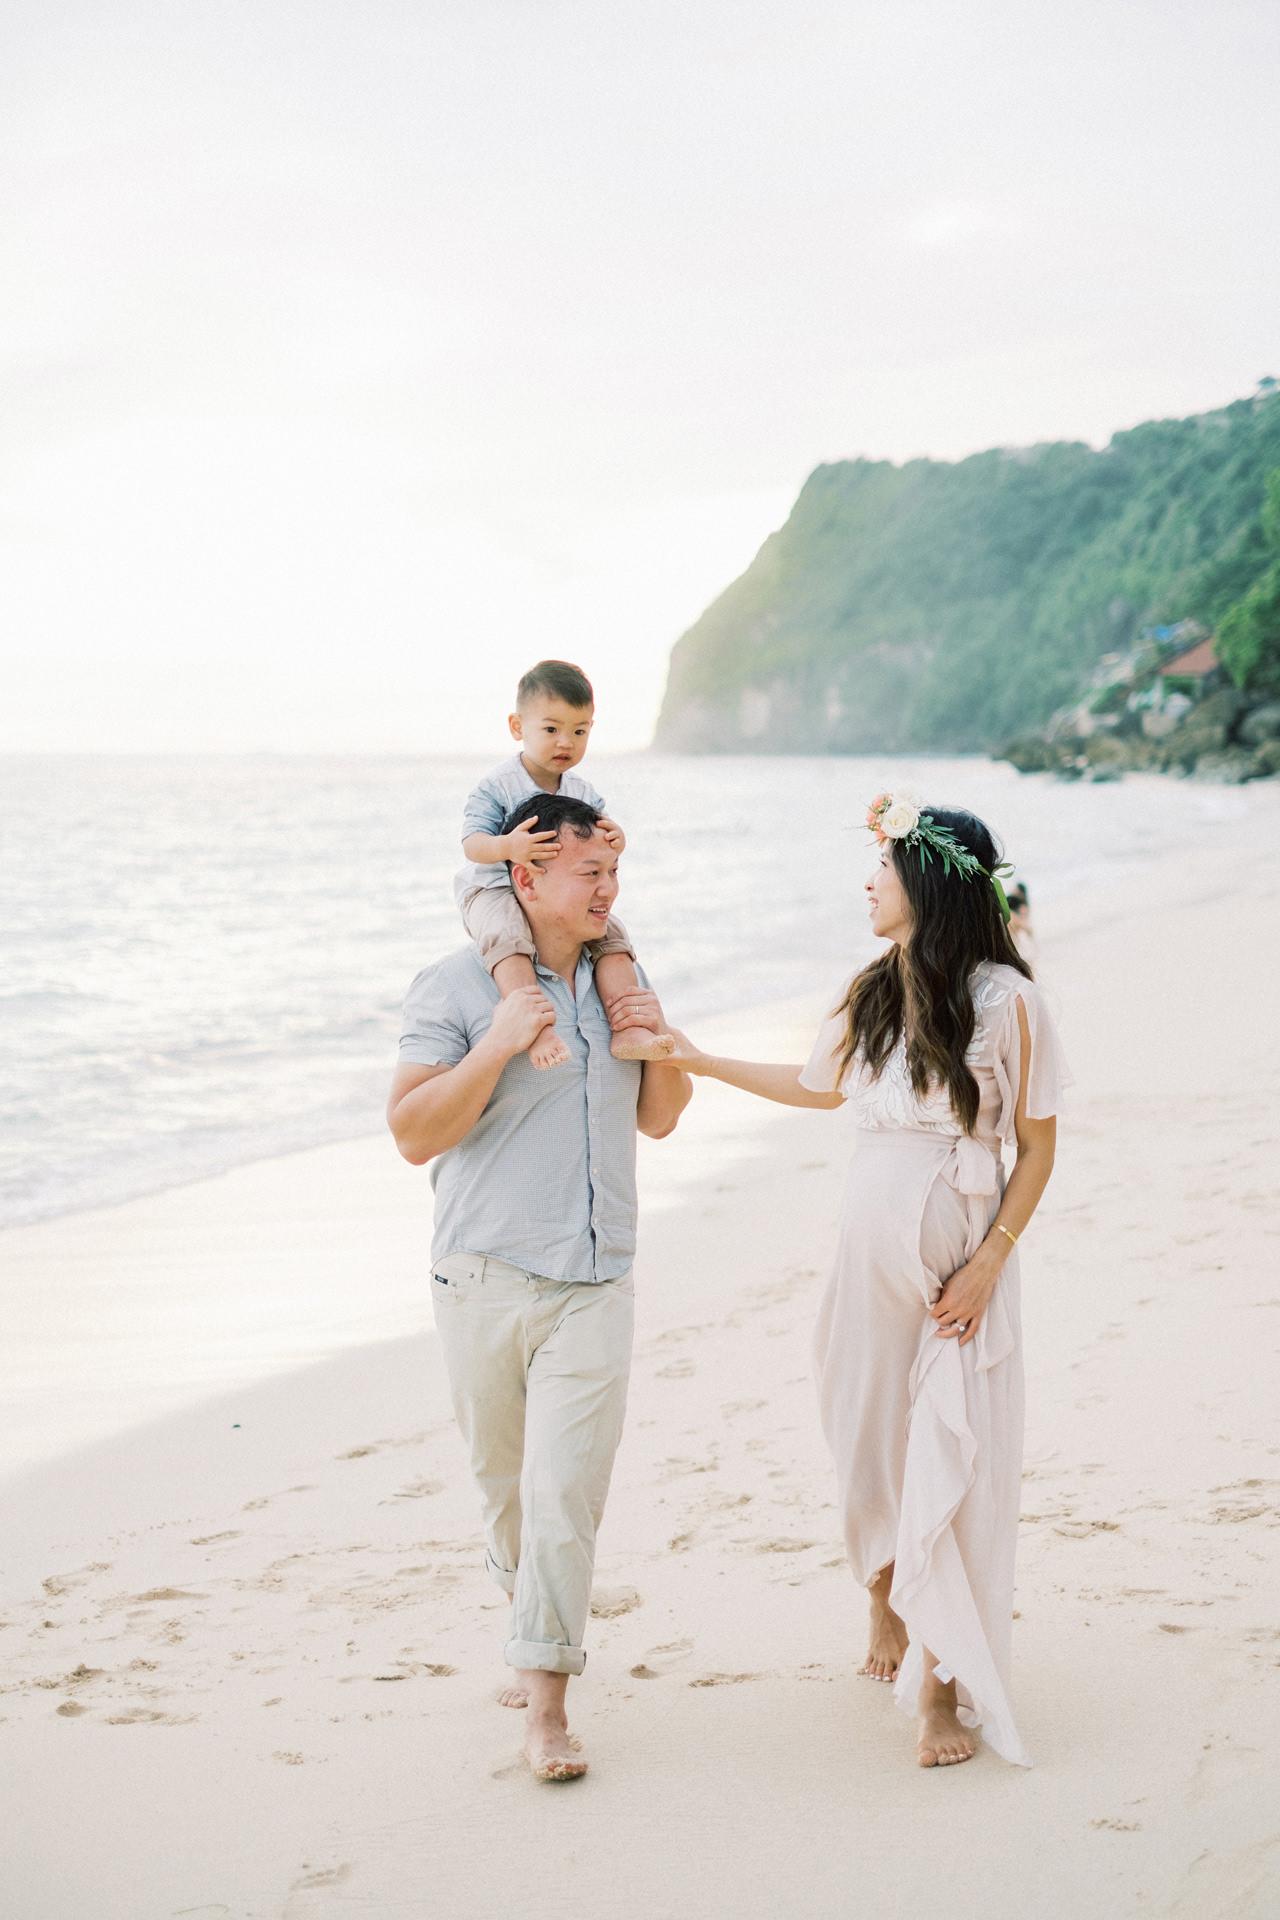 H&M: Bali Family Photo Session 2